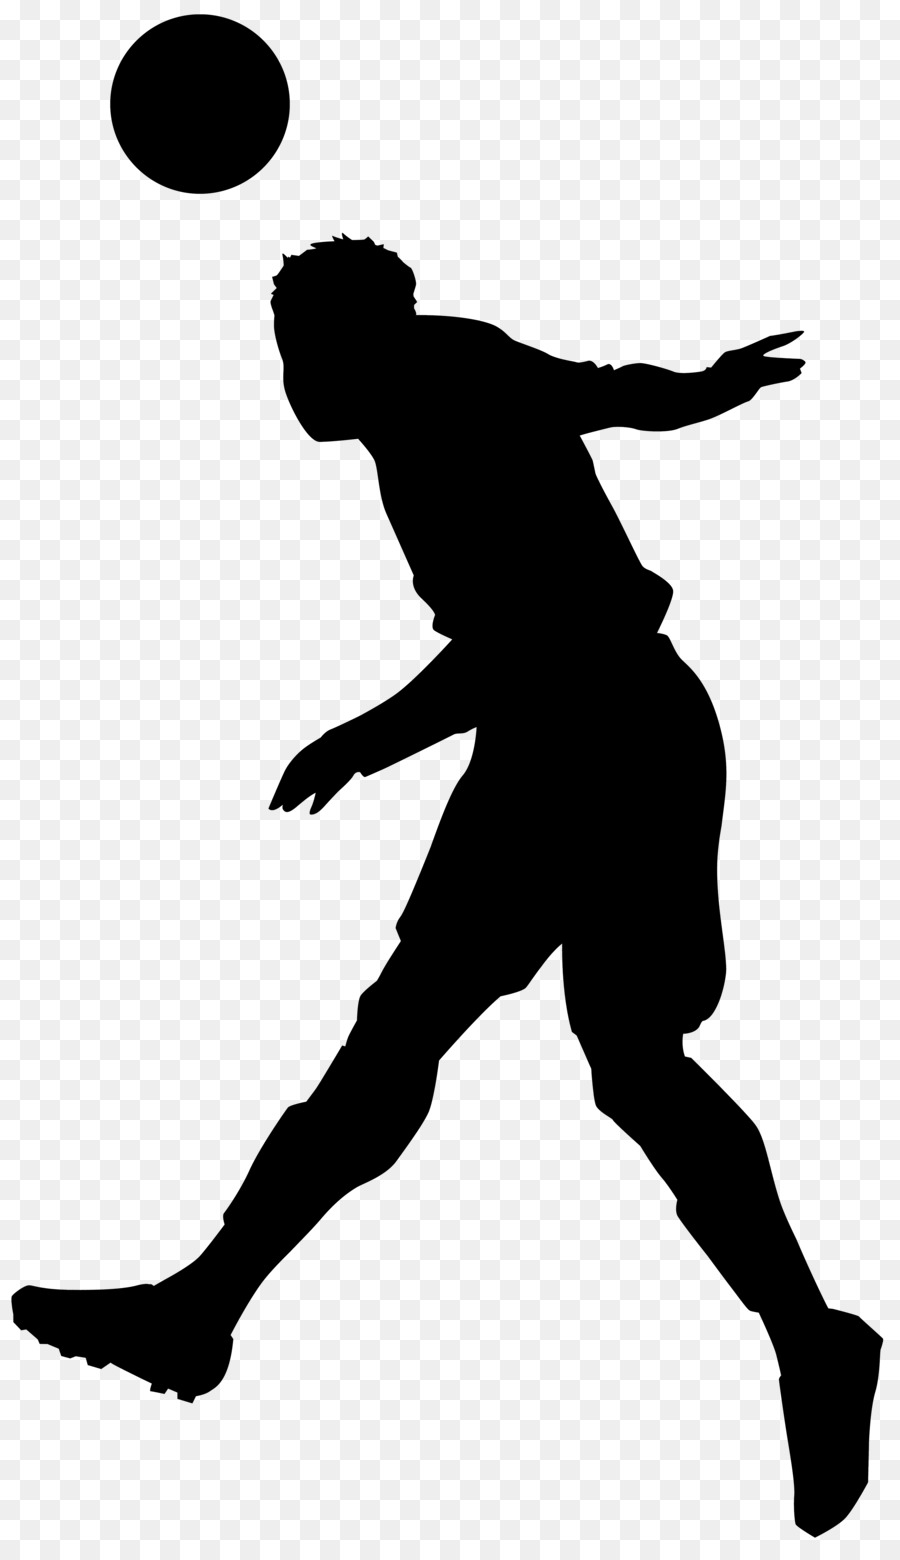 medium resolution of football player silhouette clipart football player american football clip art